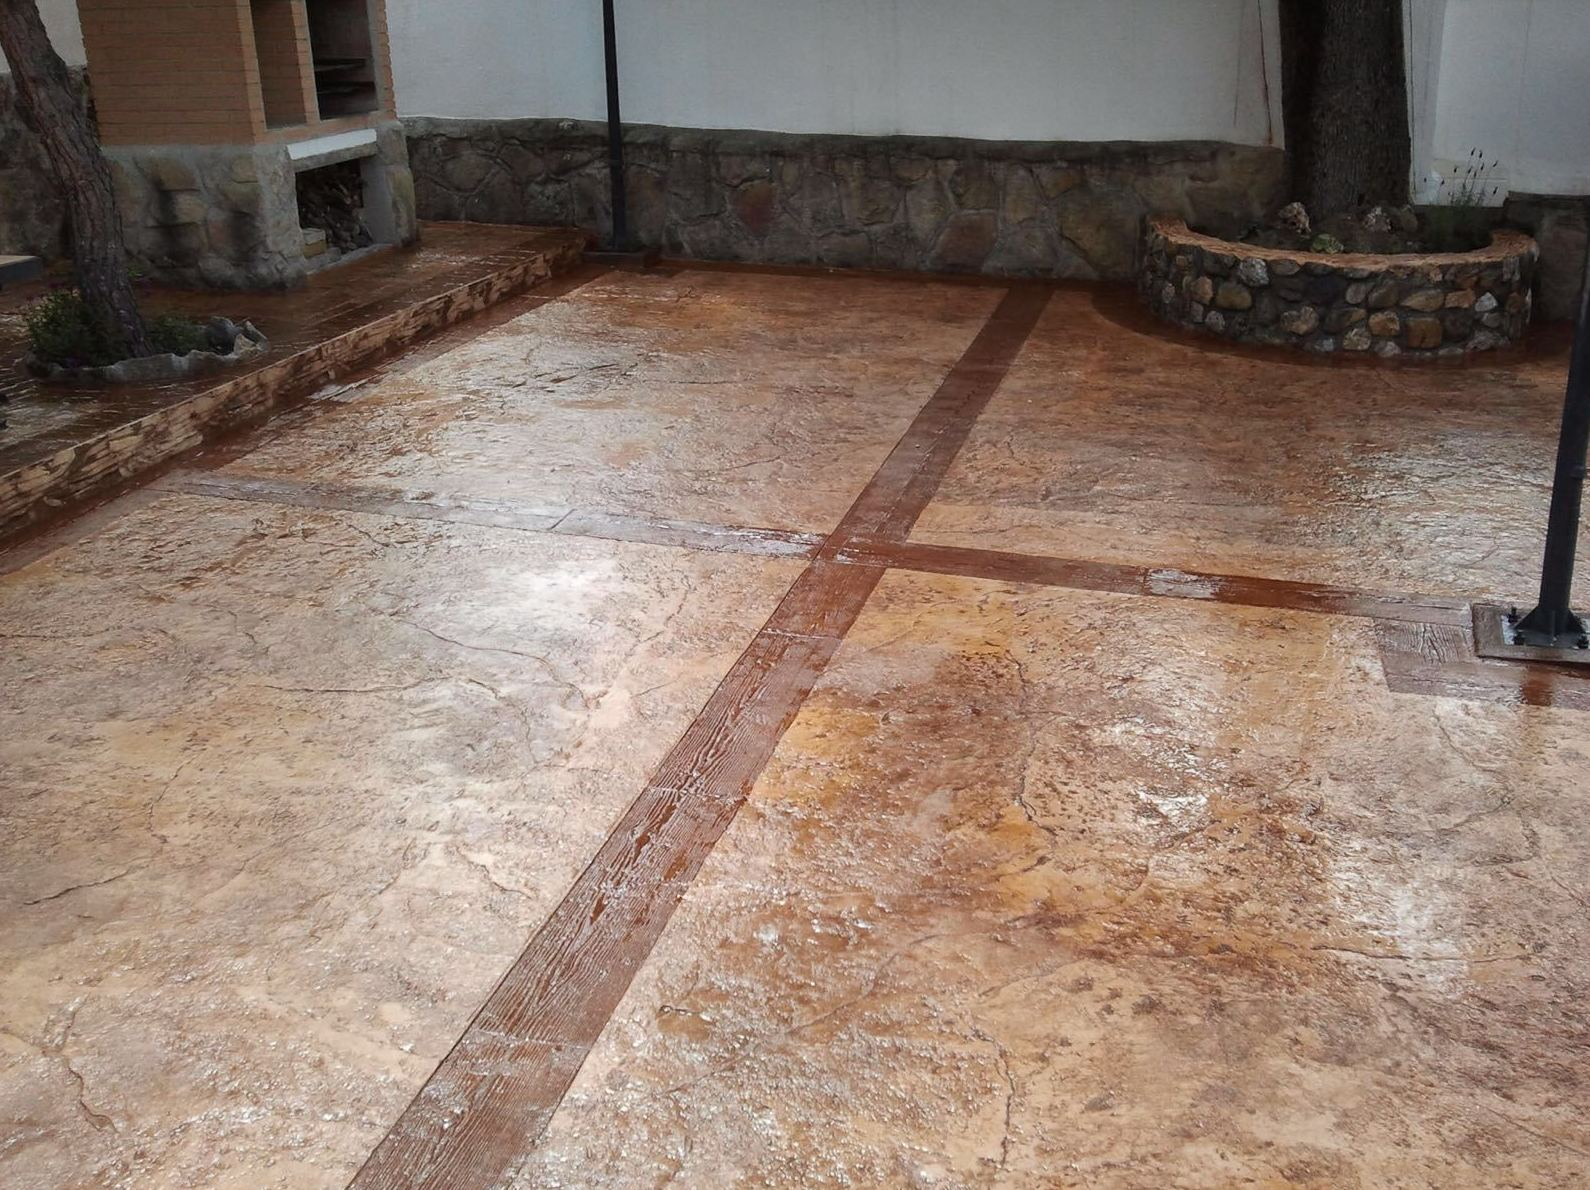 Foto 3 de Pavimentos industriales en Monsalupe | Pavimentos Arco Iris